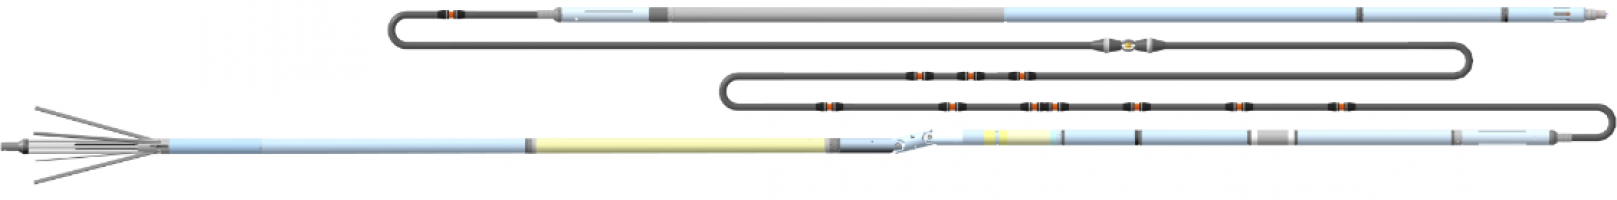 Прибор комплексный электрического каротажа, профилеметрии и инклинометрии К7А-723-M(К8)